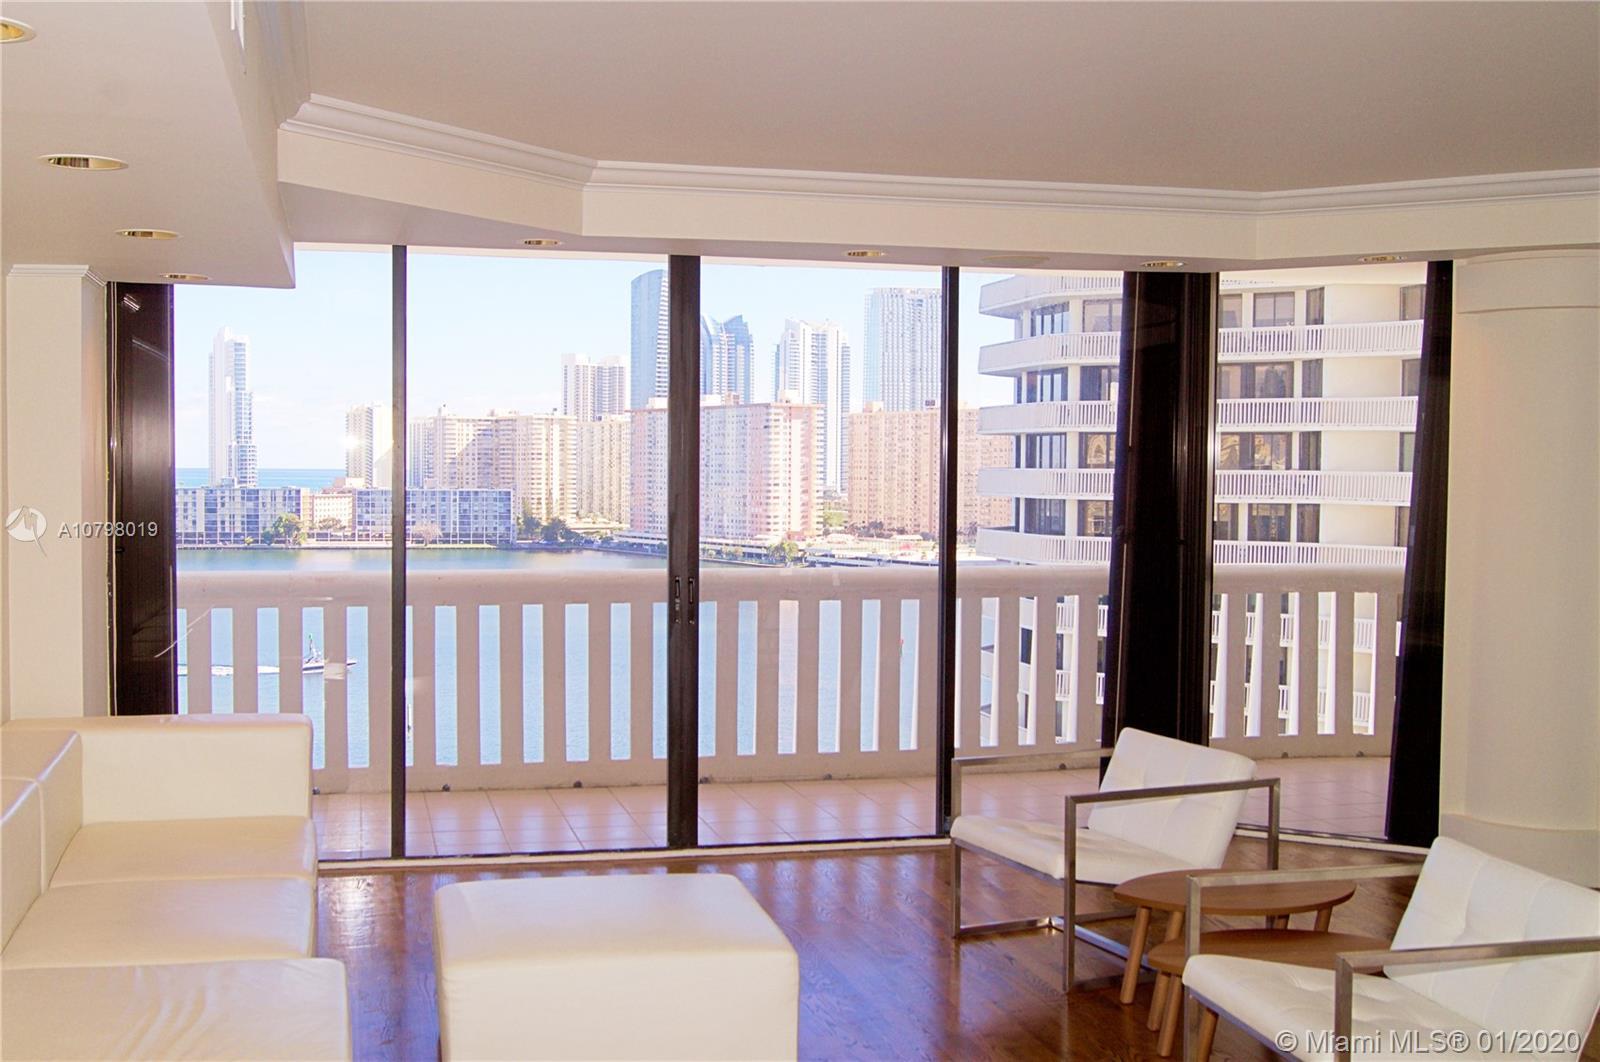 3000 Island Blvd #1202, Aventura, FL 33160 - Aventura, FL real estate listing